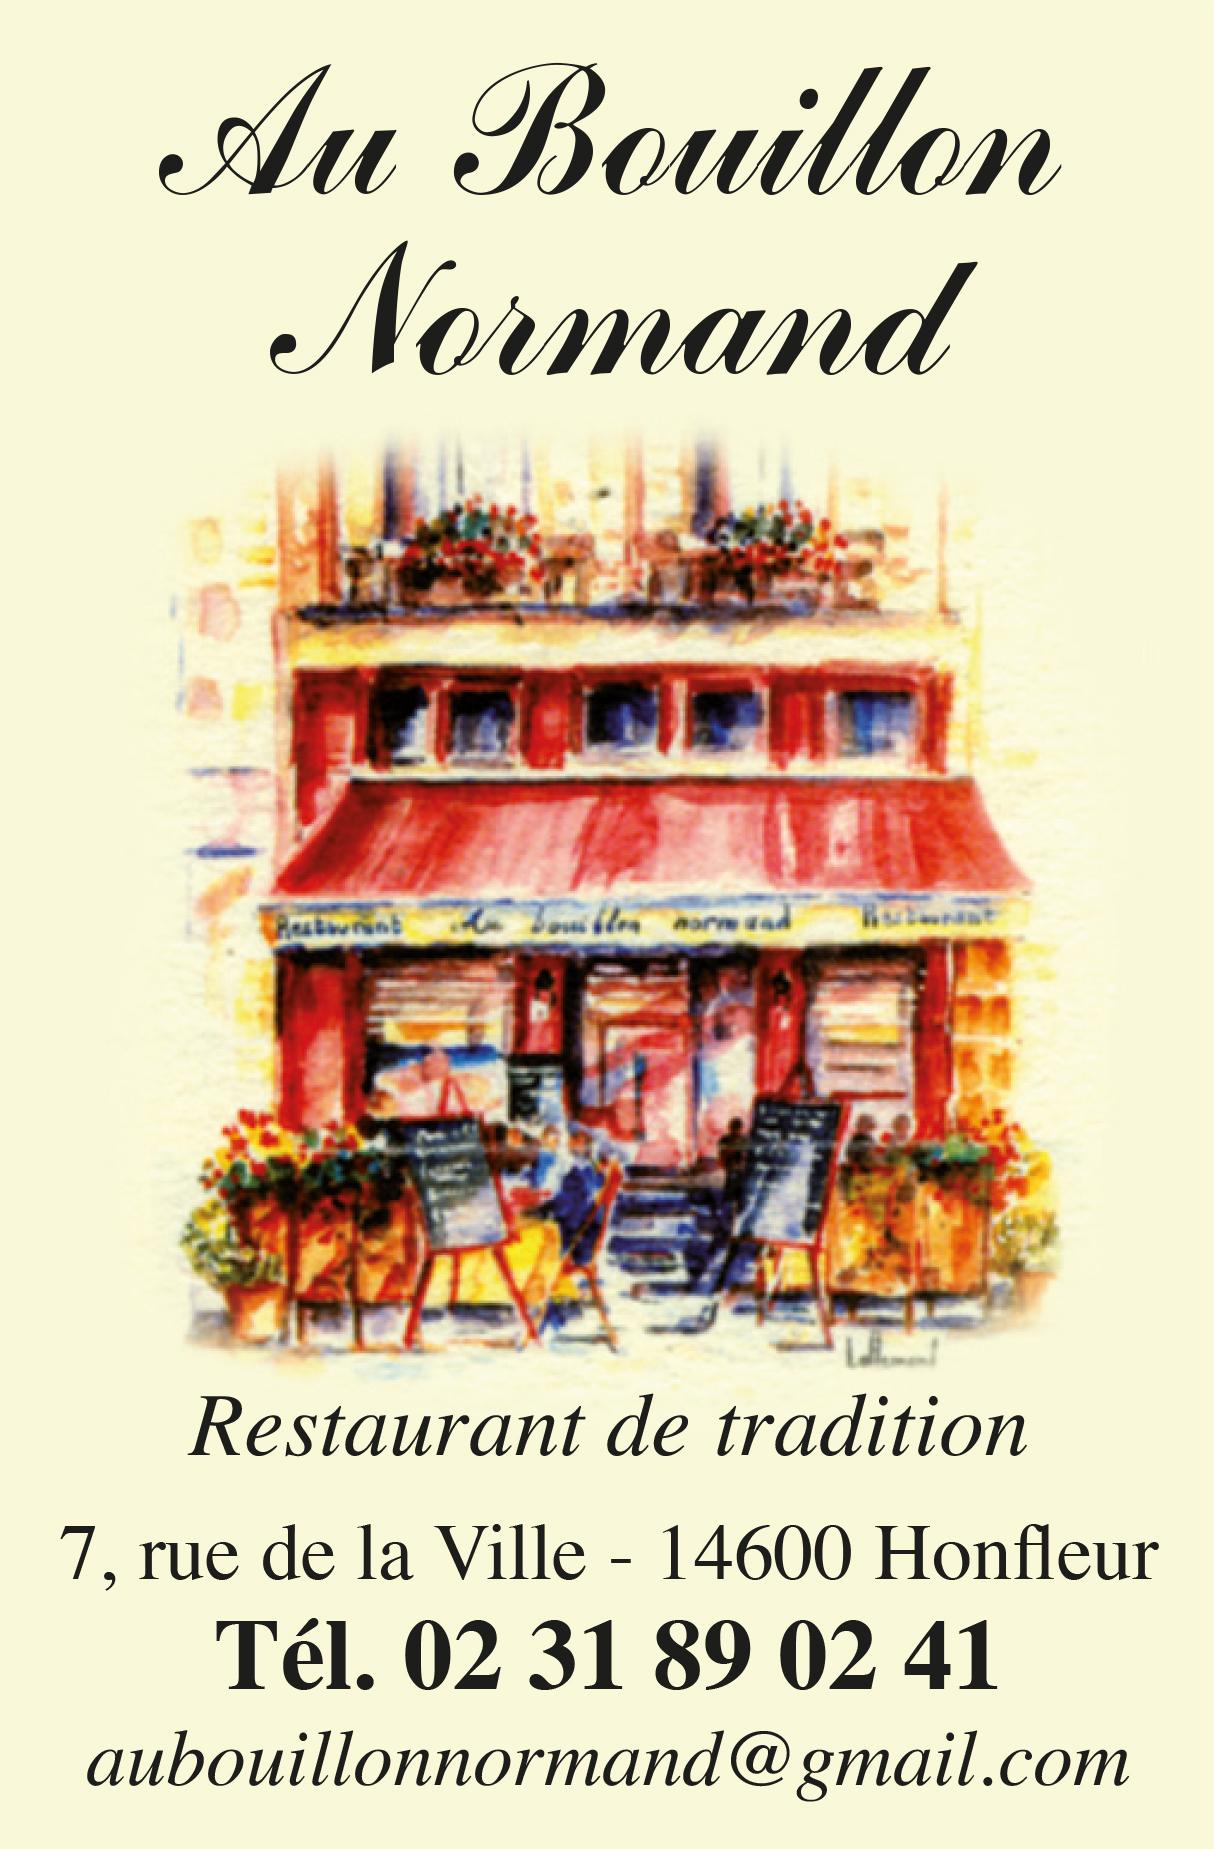 37 - Au Bouillon Normand